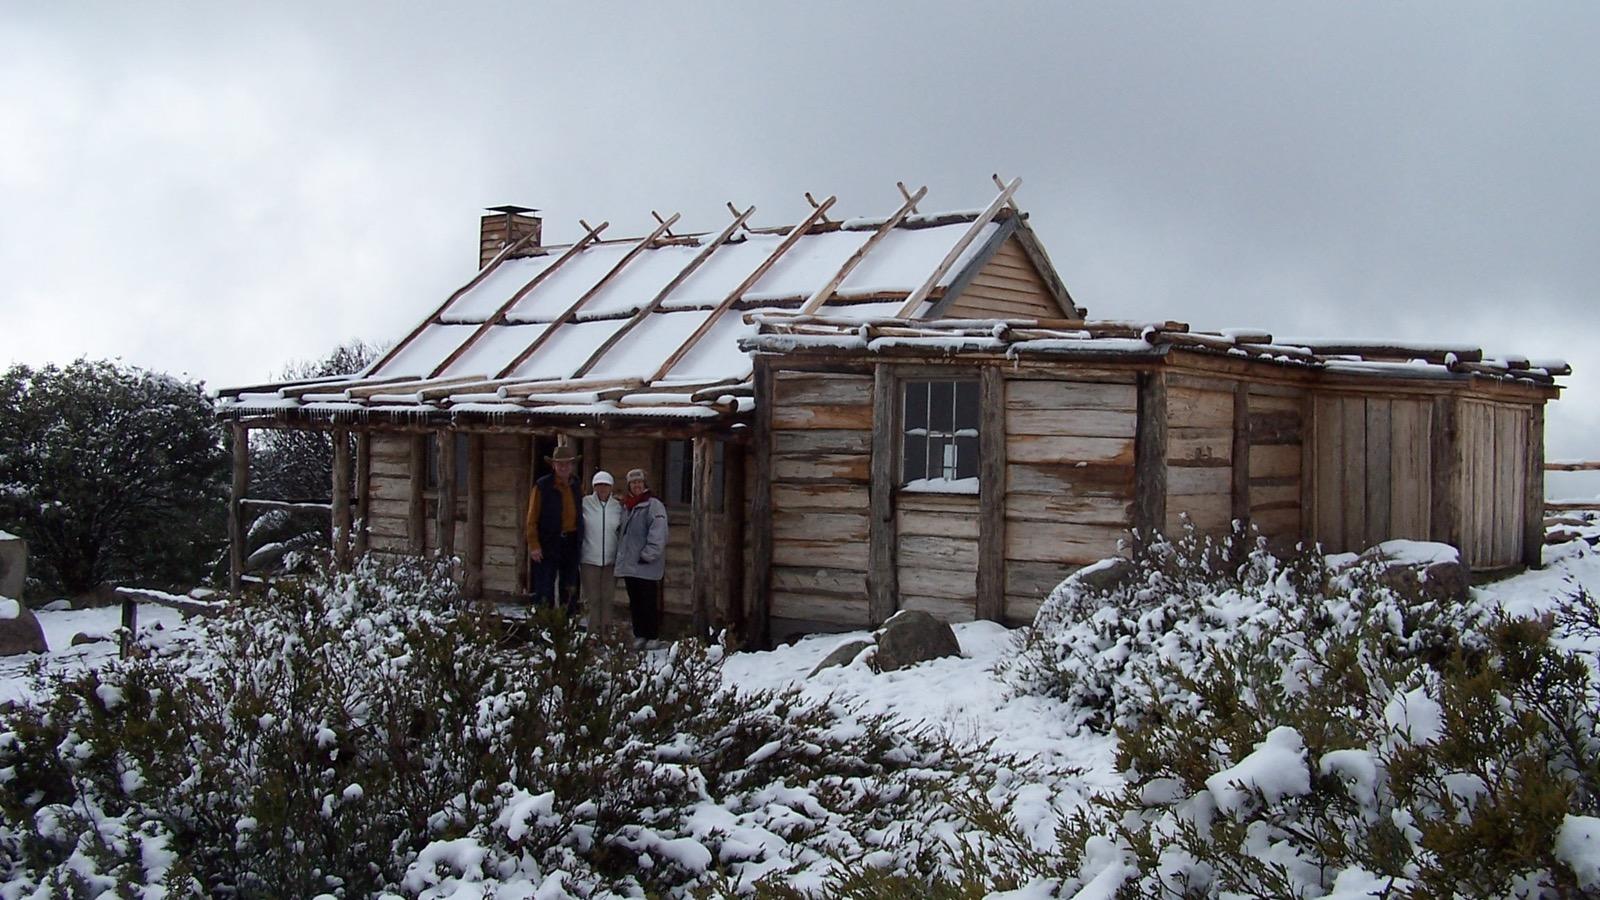 Craig's Hut Early winter